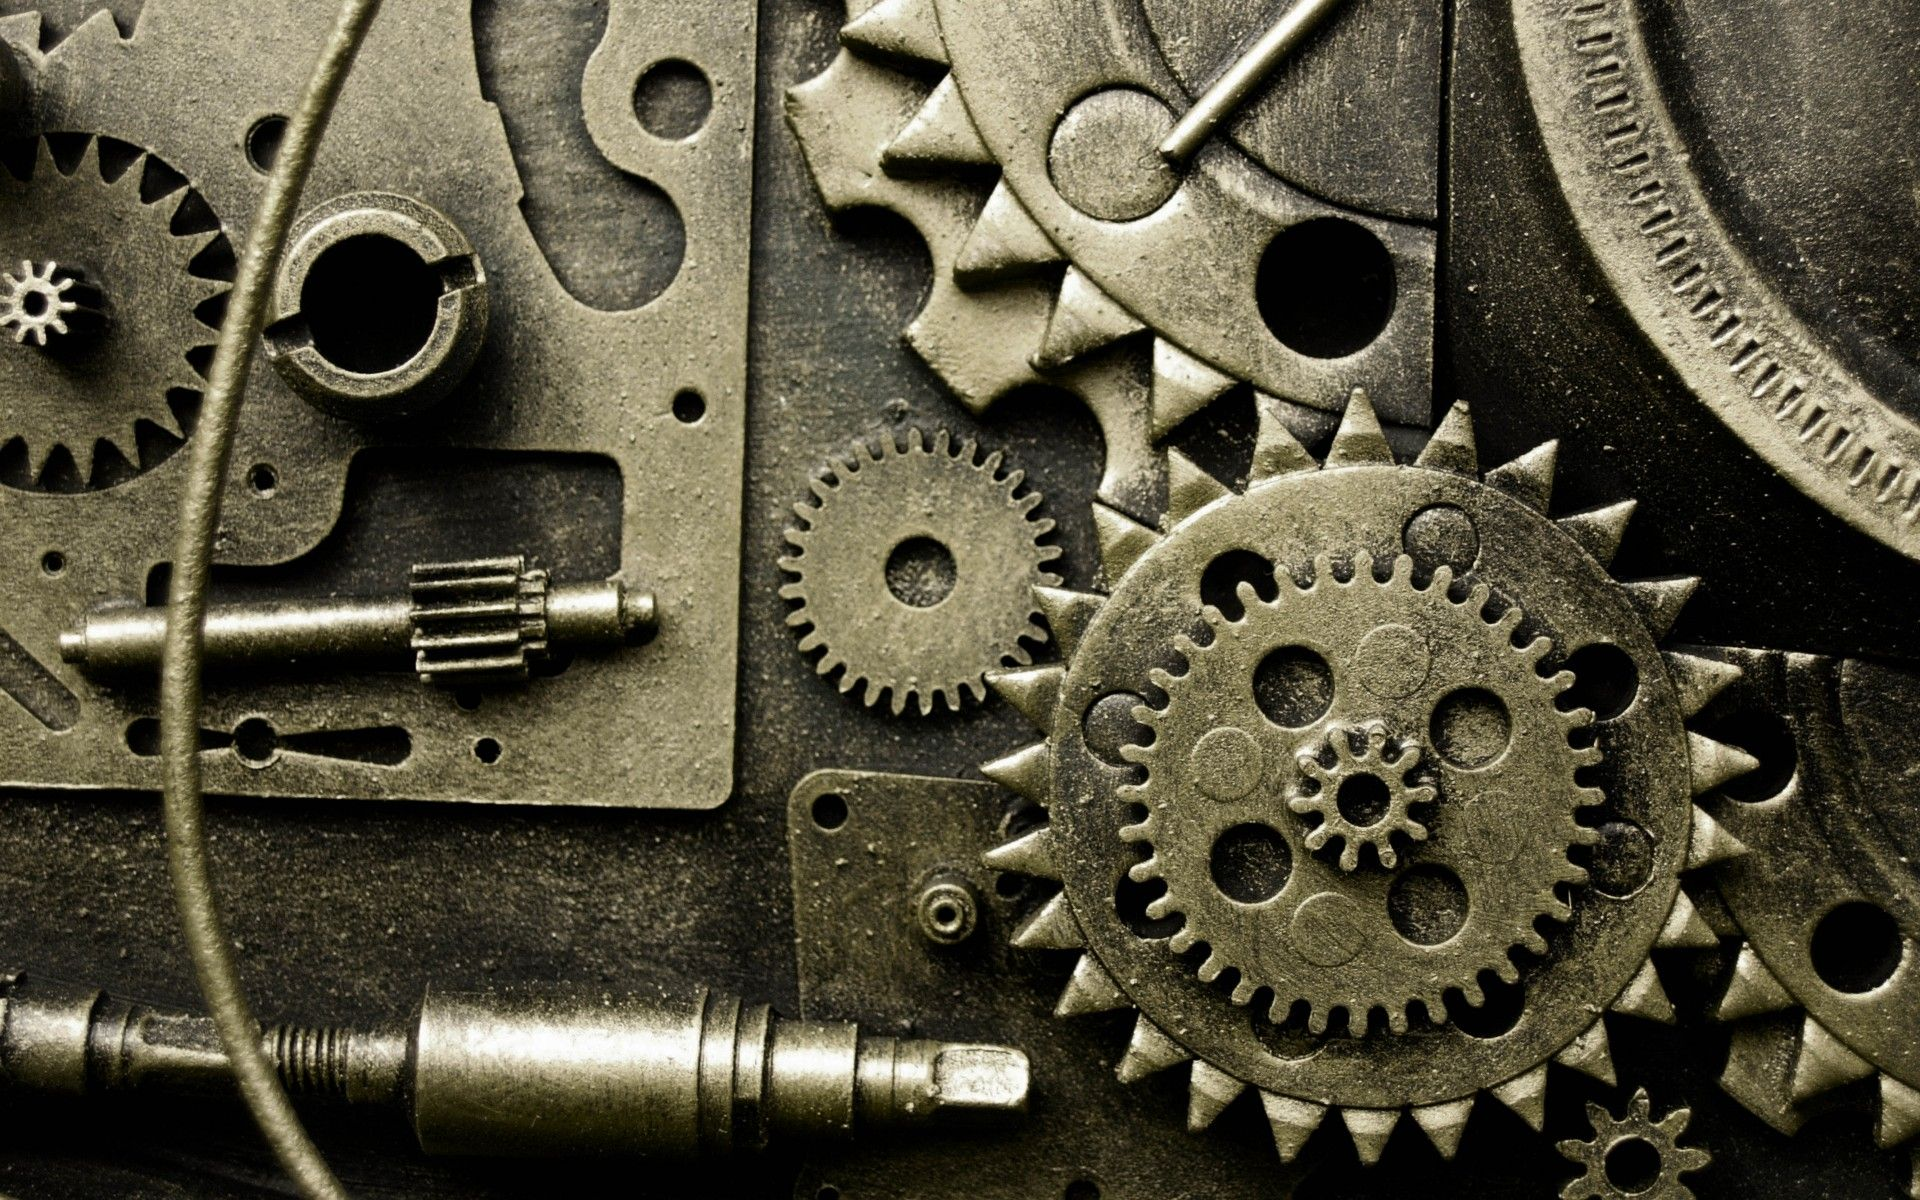 Watch Top Gear Online >> Metal gears abstract machine pattern wallpaper | 1920x1200 ...